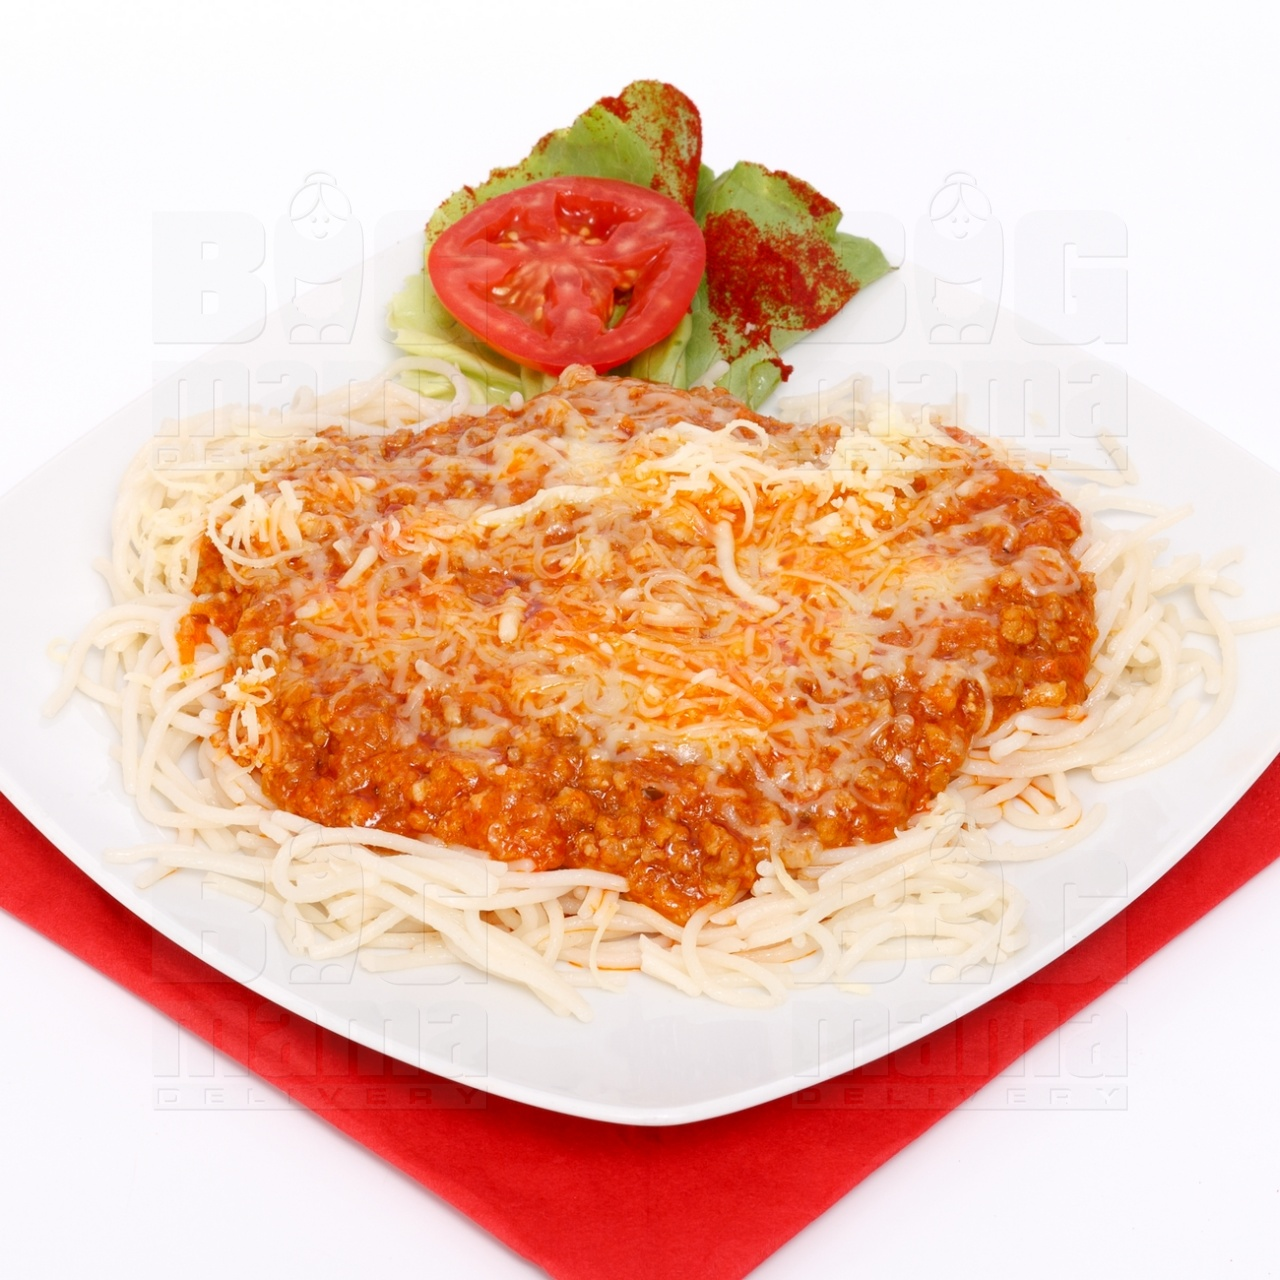 Product #46 image - Spaghete Bolognese